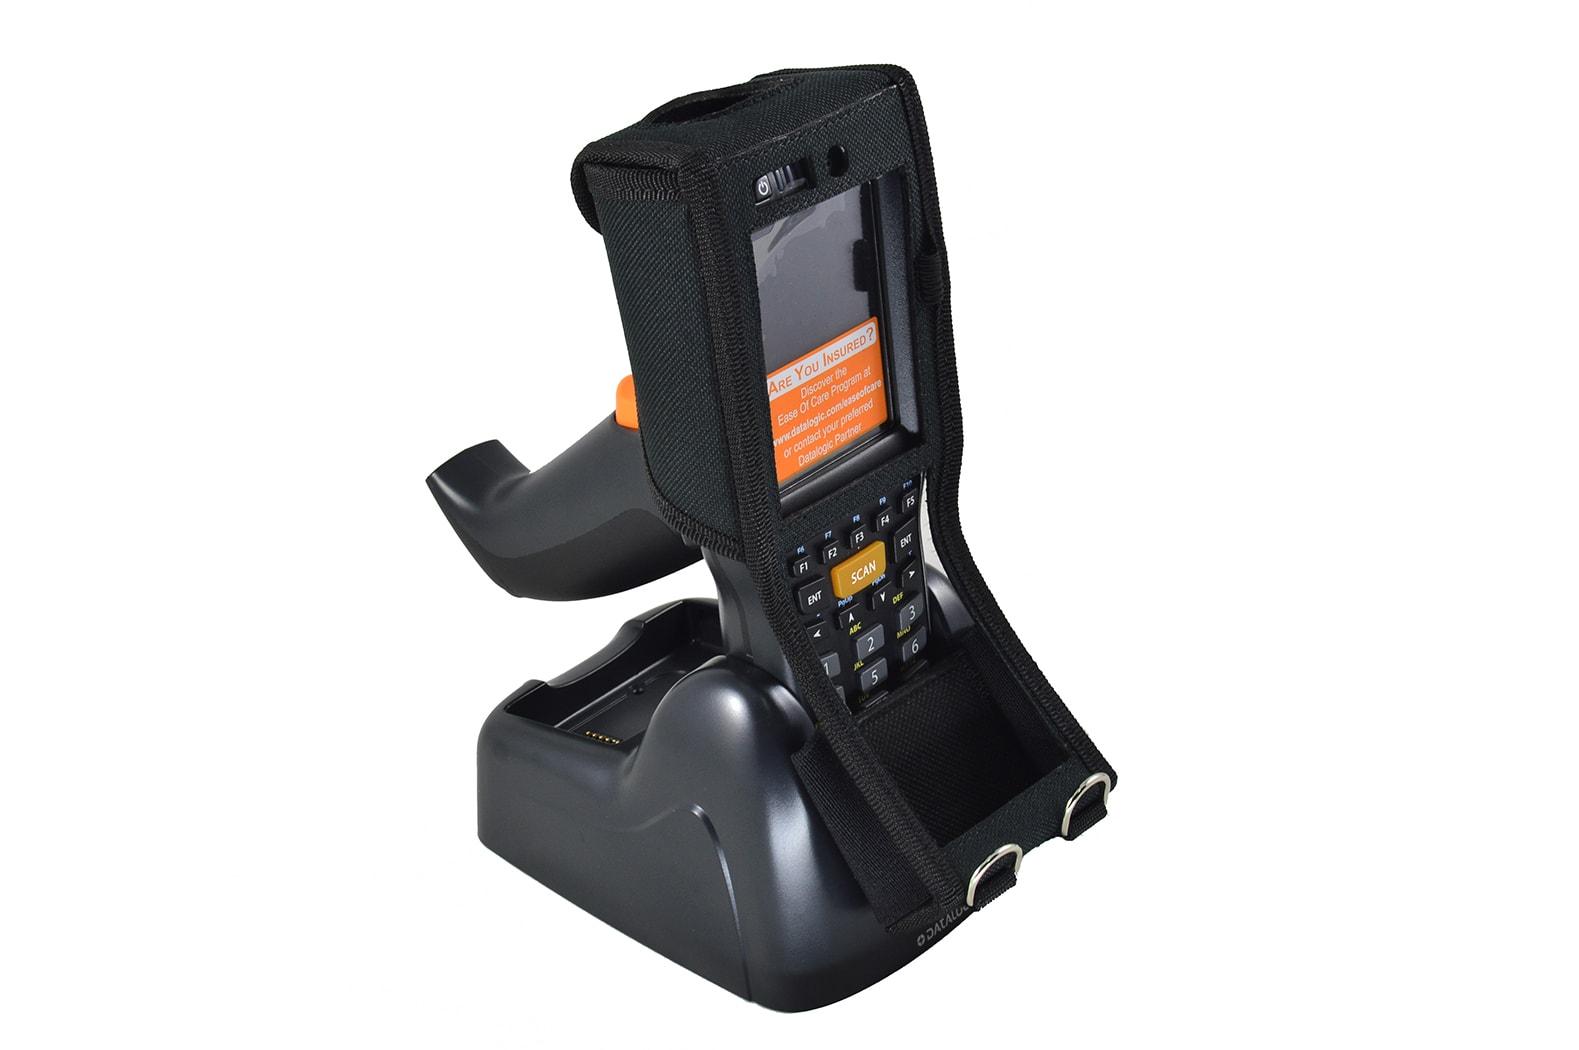 Funda Proteccion Datalogic Skorpio X3 X4 Pistol Grip